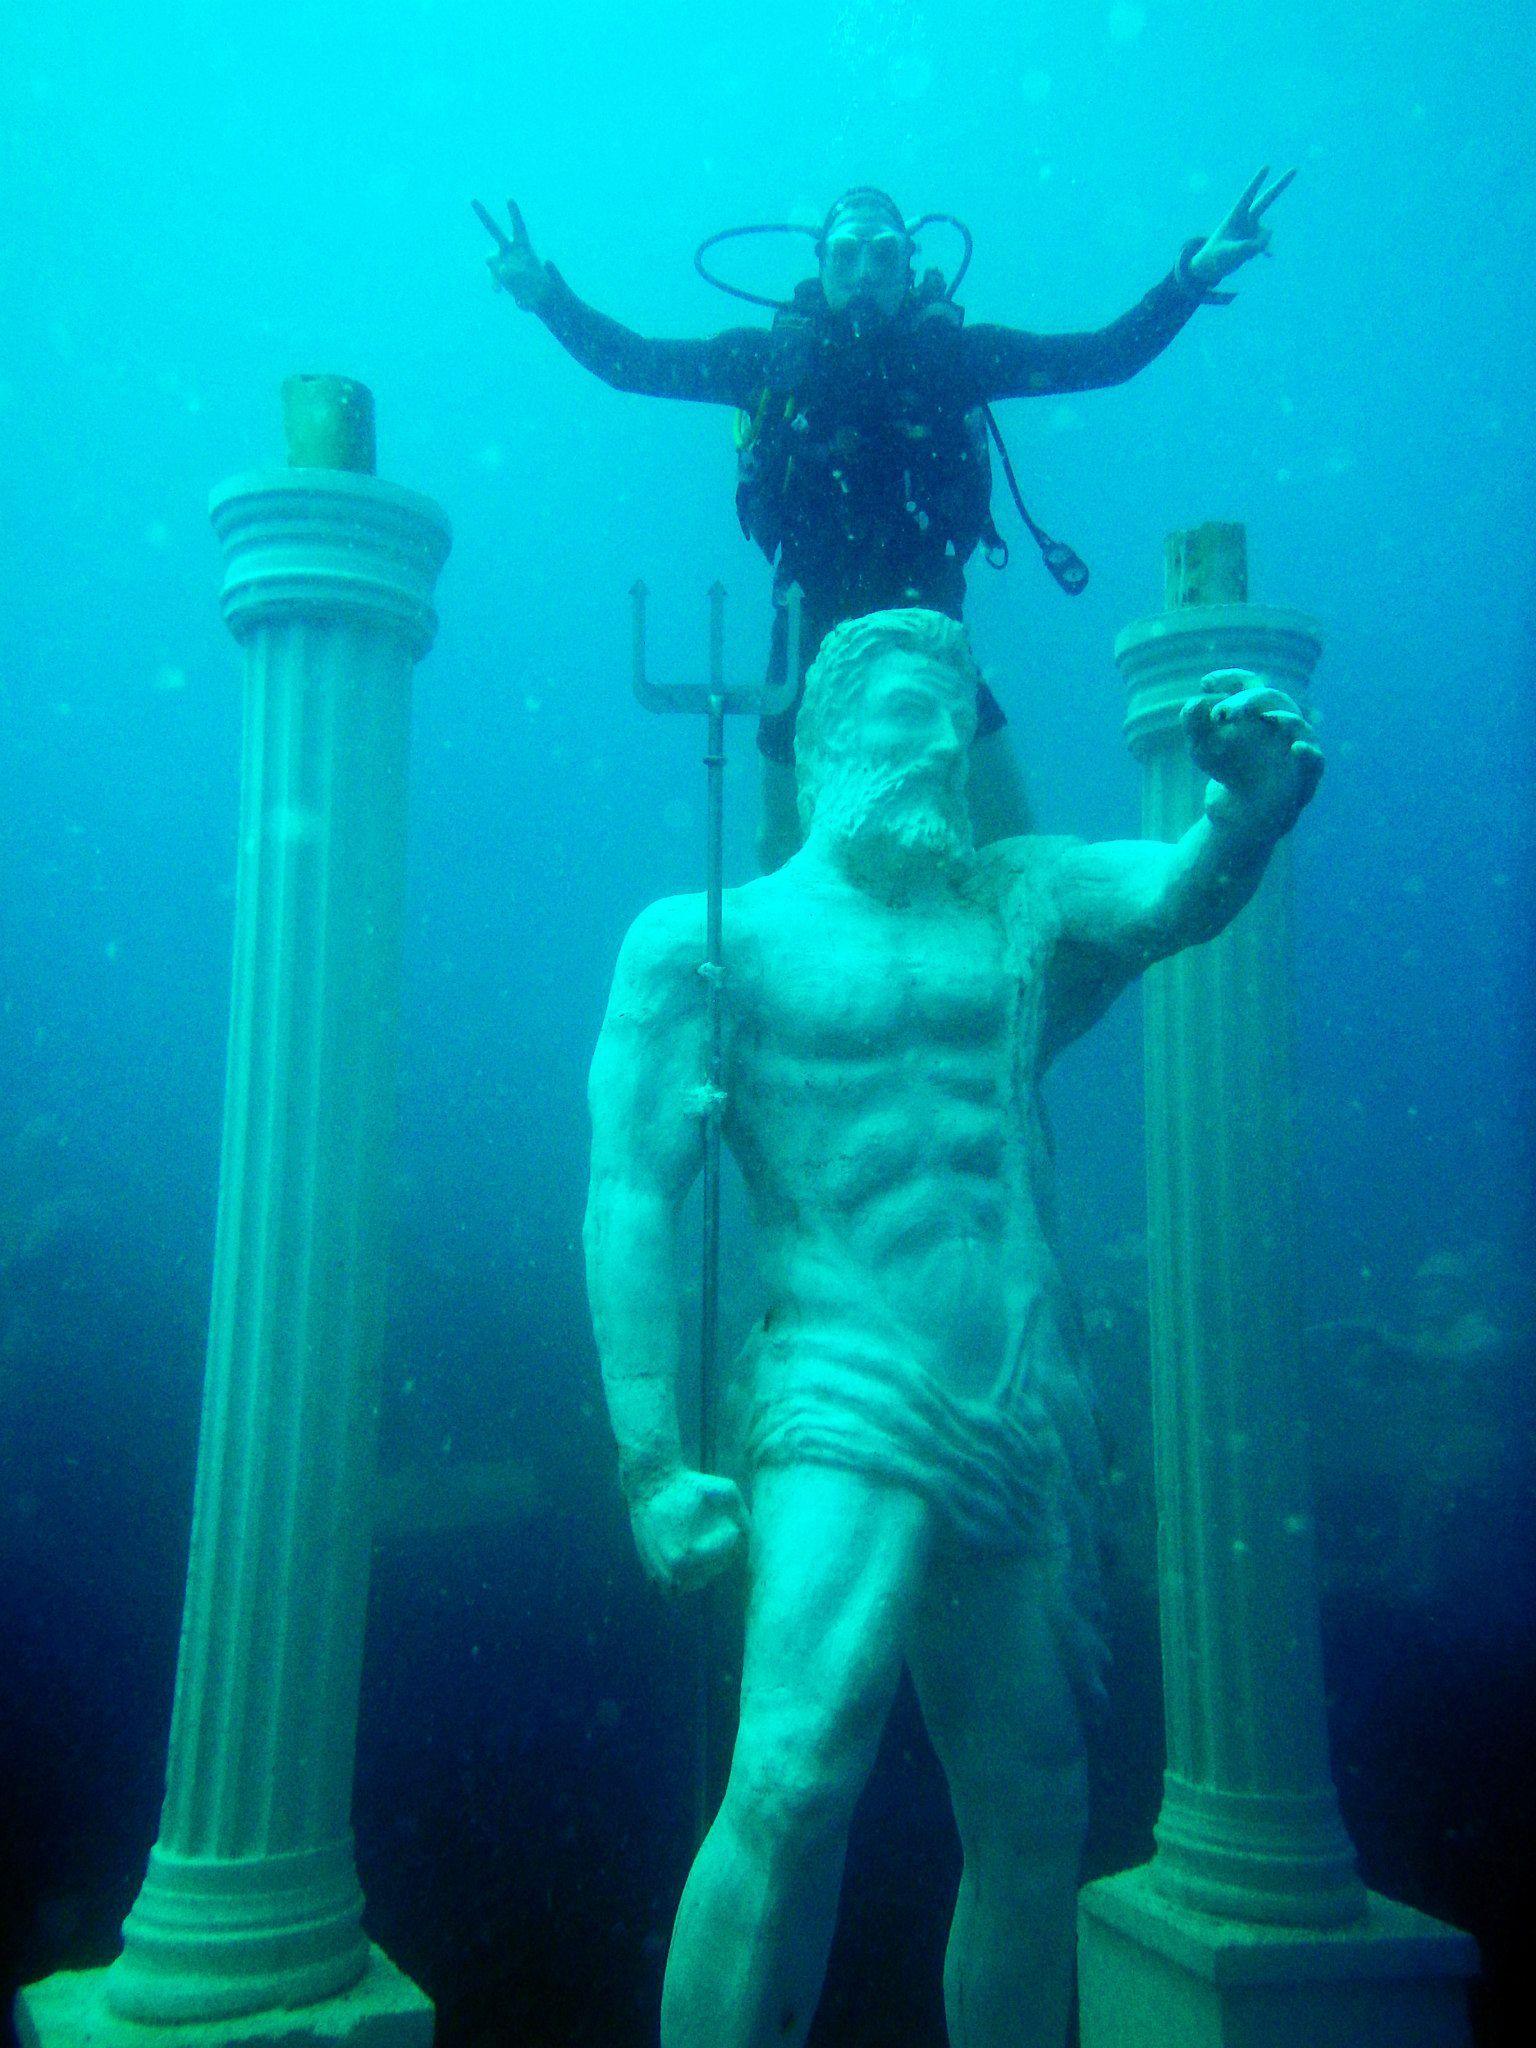 Underwater Museum Side Antalya Turkey Koto Travel Colors - Europes first ever underwater museum is full of hyperrealistic human sculptures